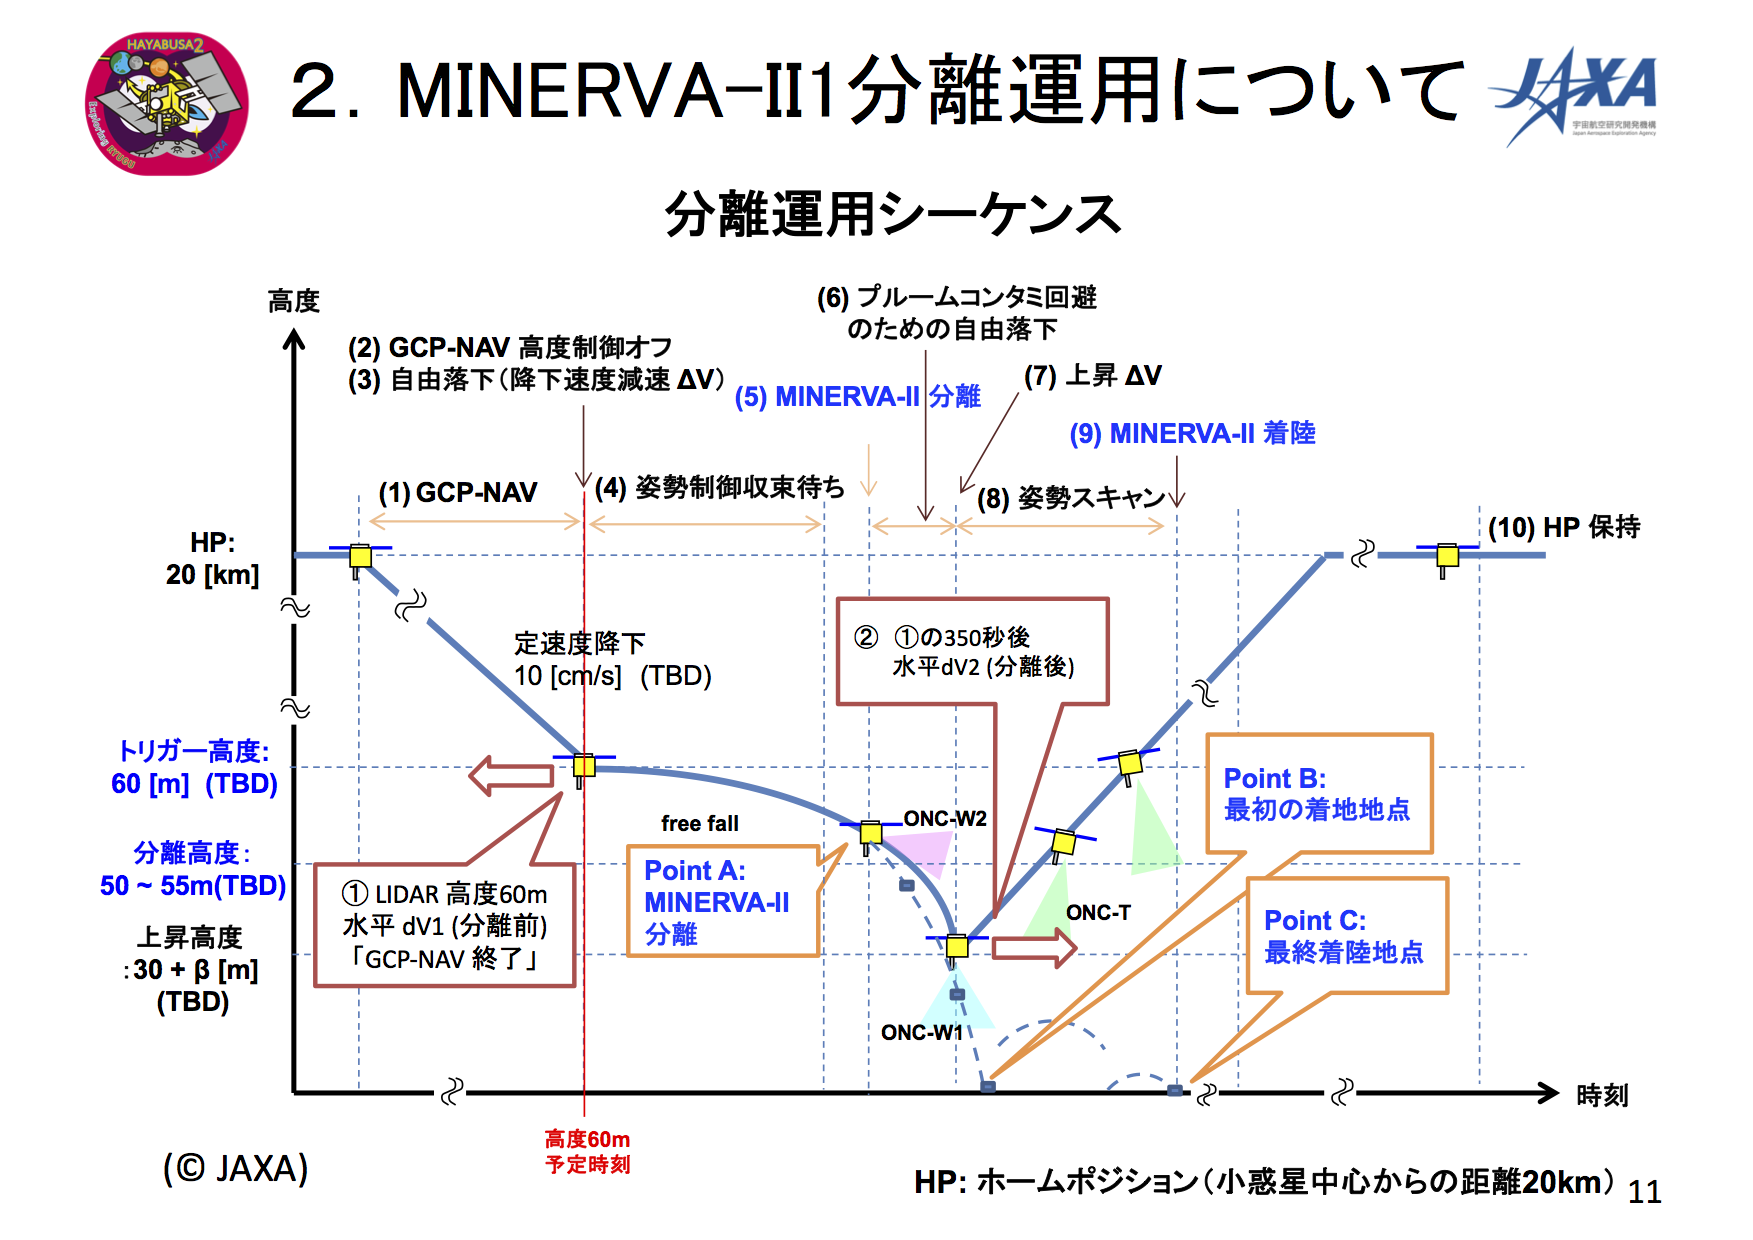 f:id:Imamura:20180921145501p:plain